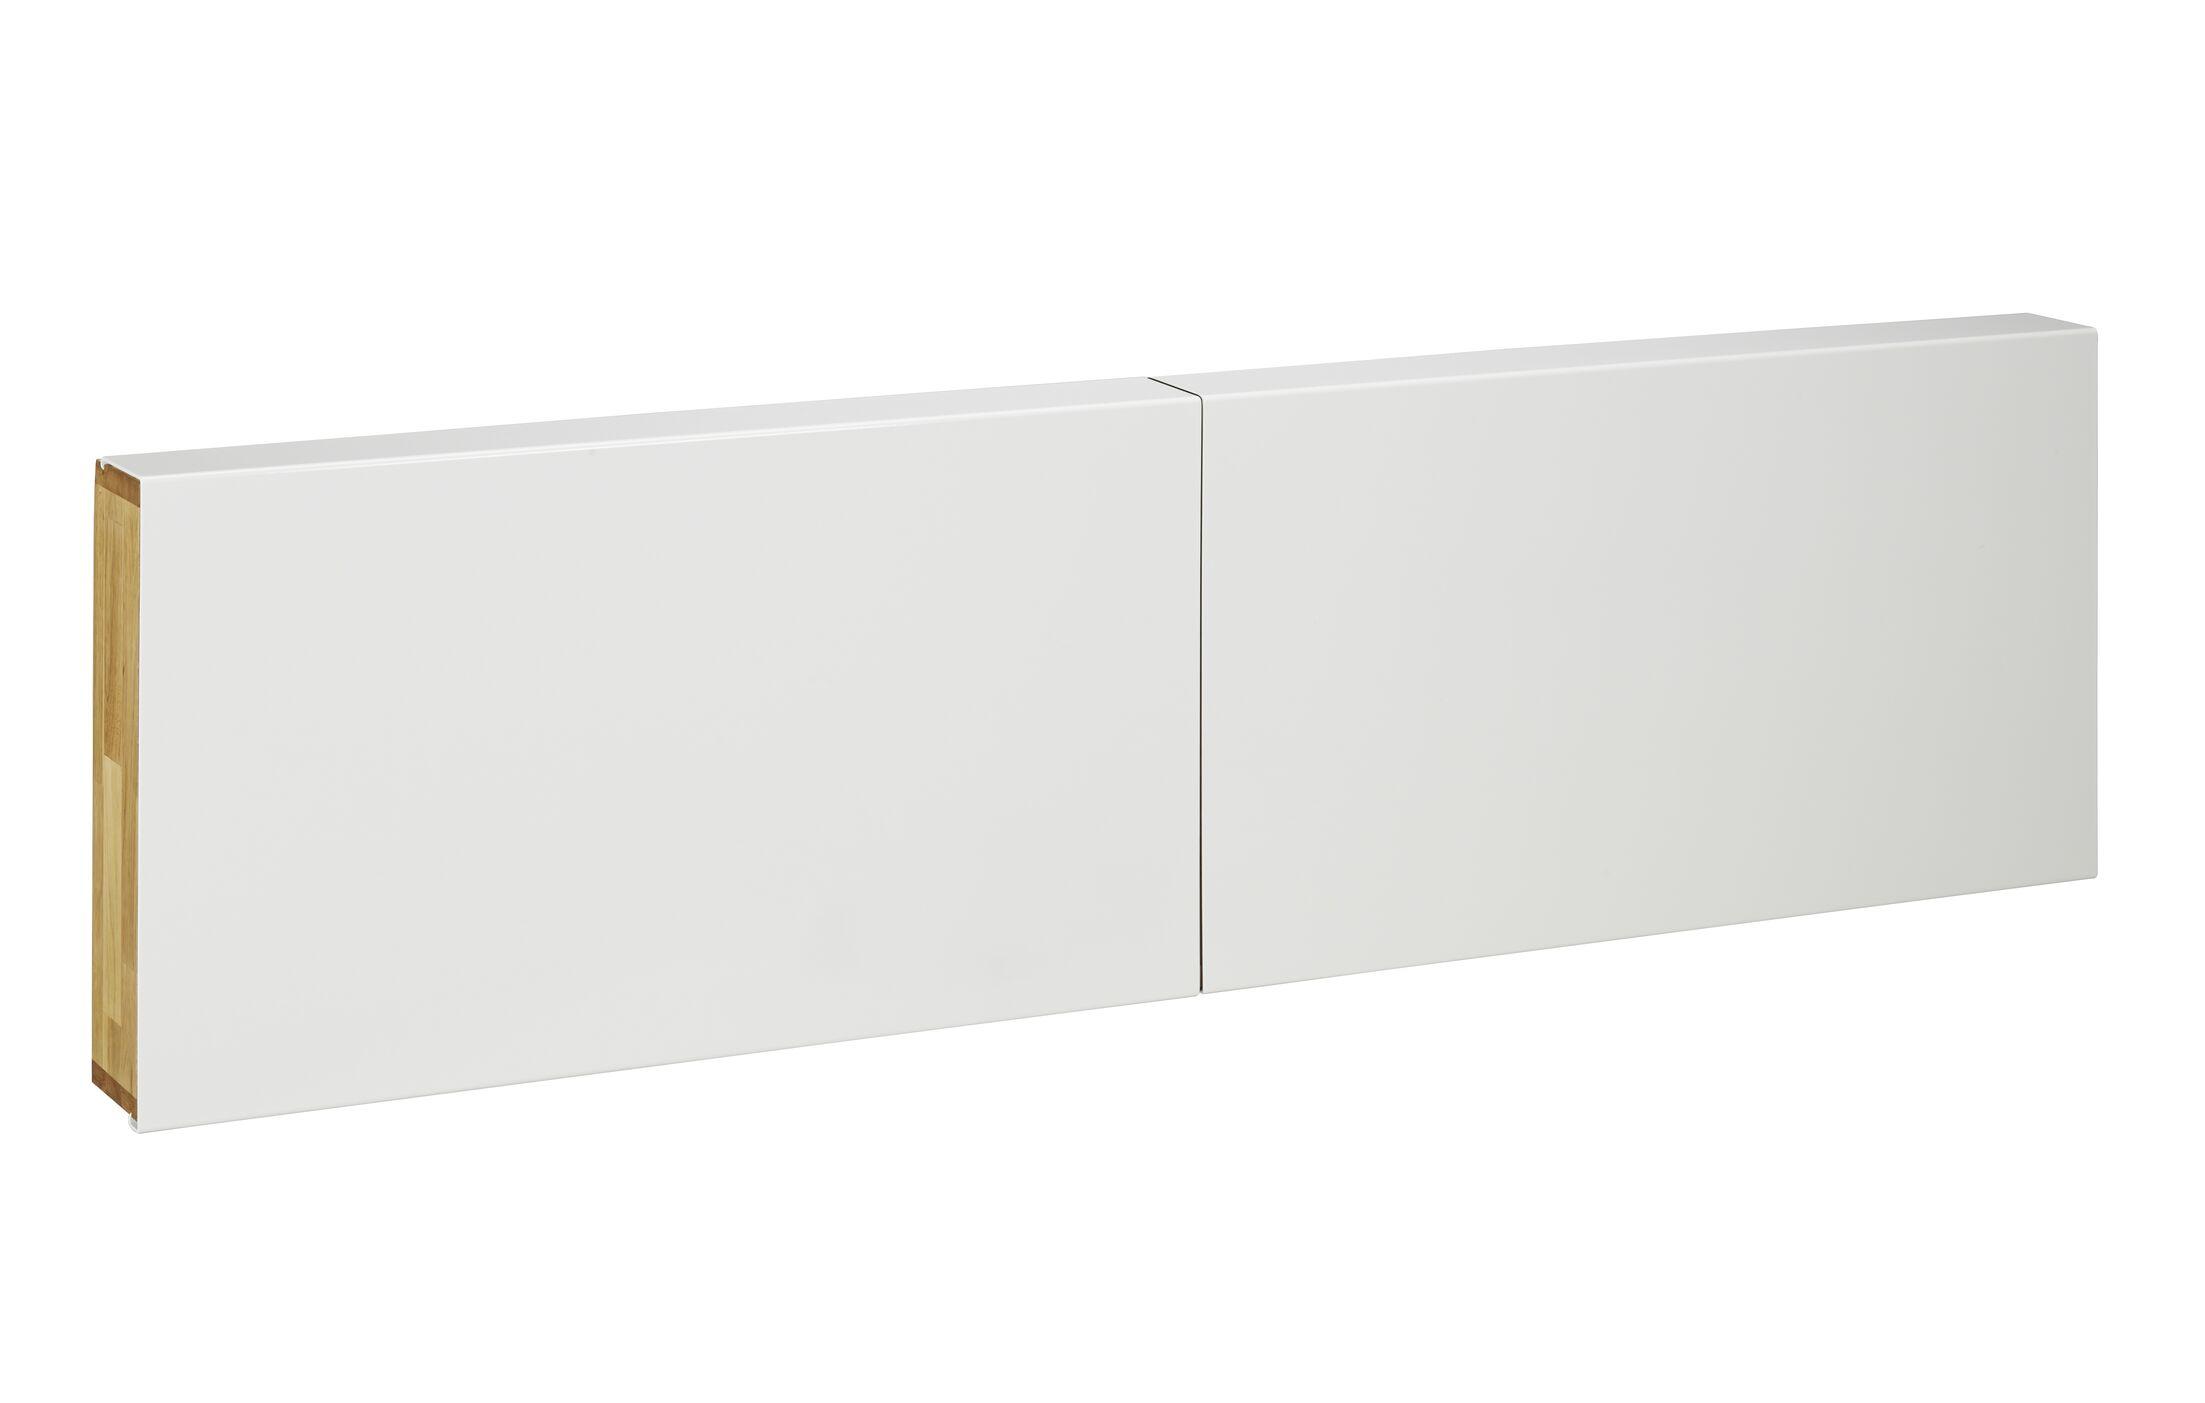 LAX Series Bookcase Headboard Size: King